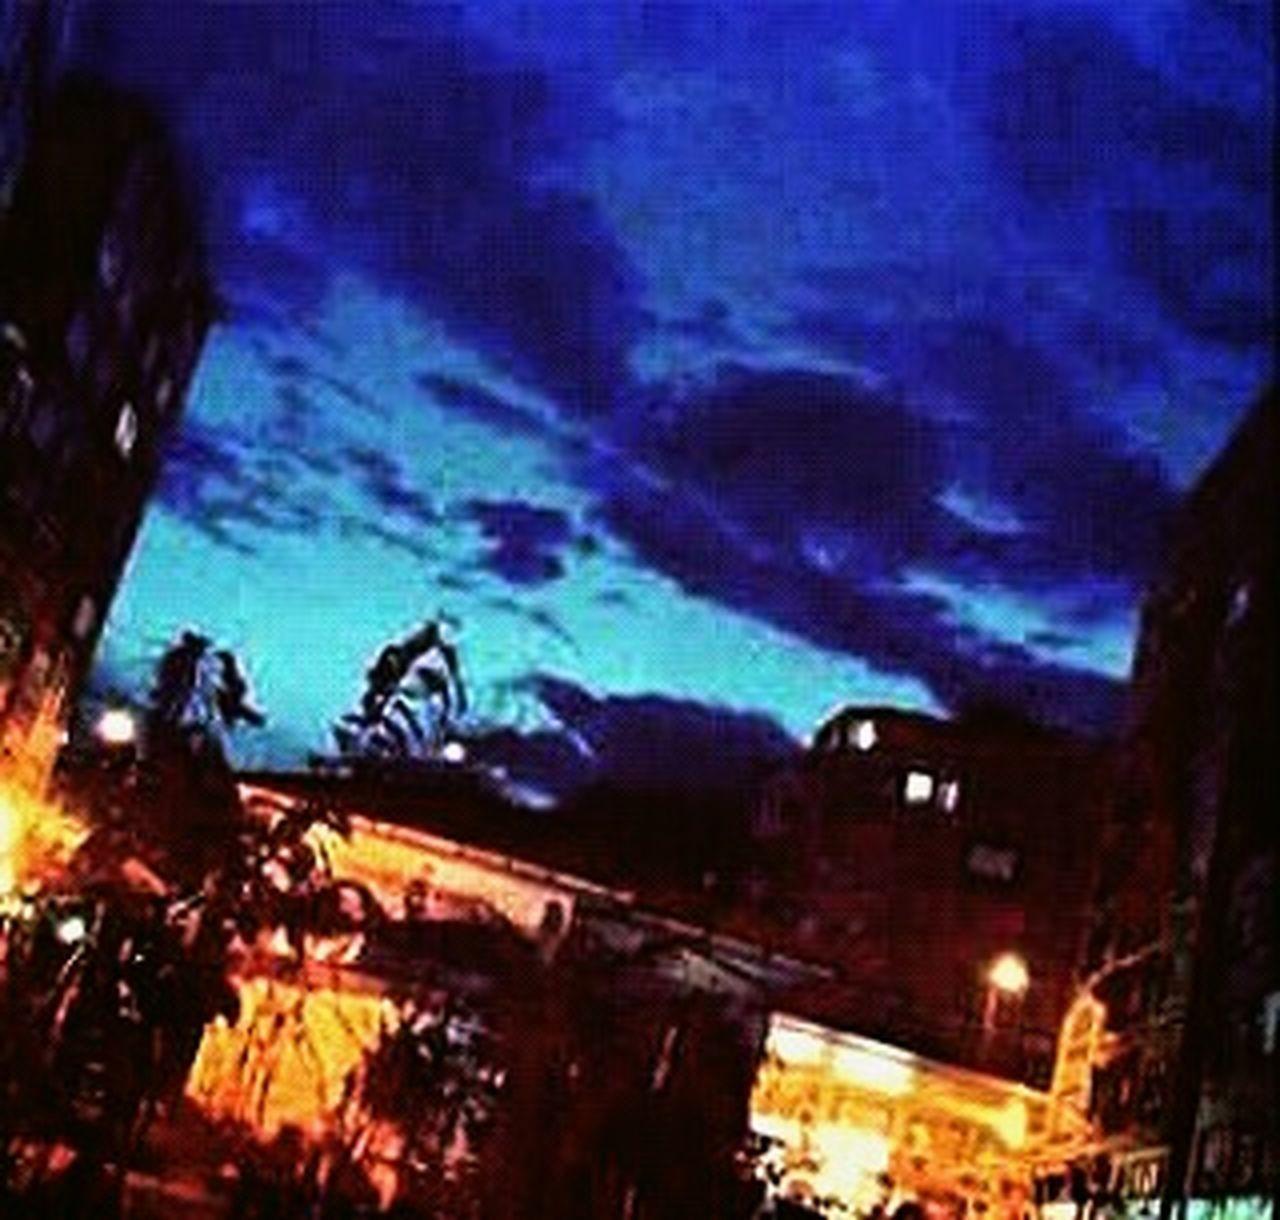 night, illuminated, no people, outdoors, city, nature, animal themes, sky